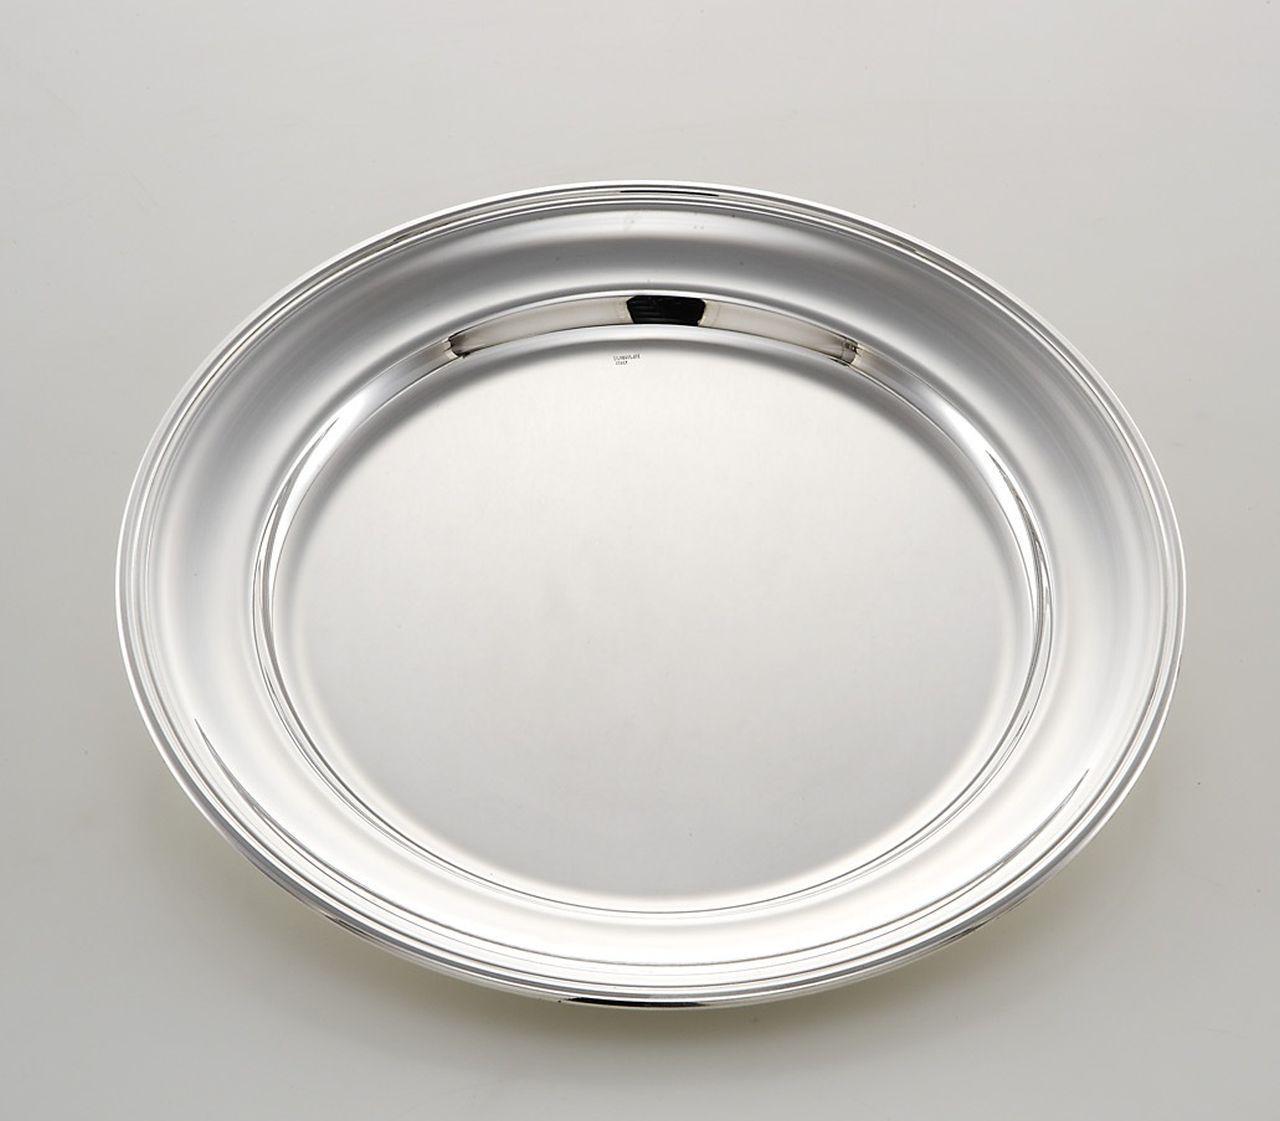 Piatto tondo portata stile Inglese argentato argento sheffield cm.diam.18